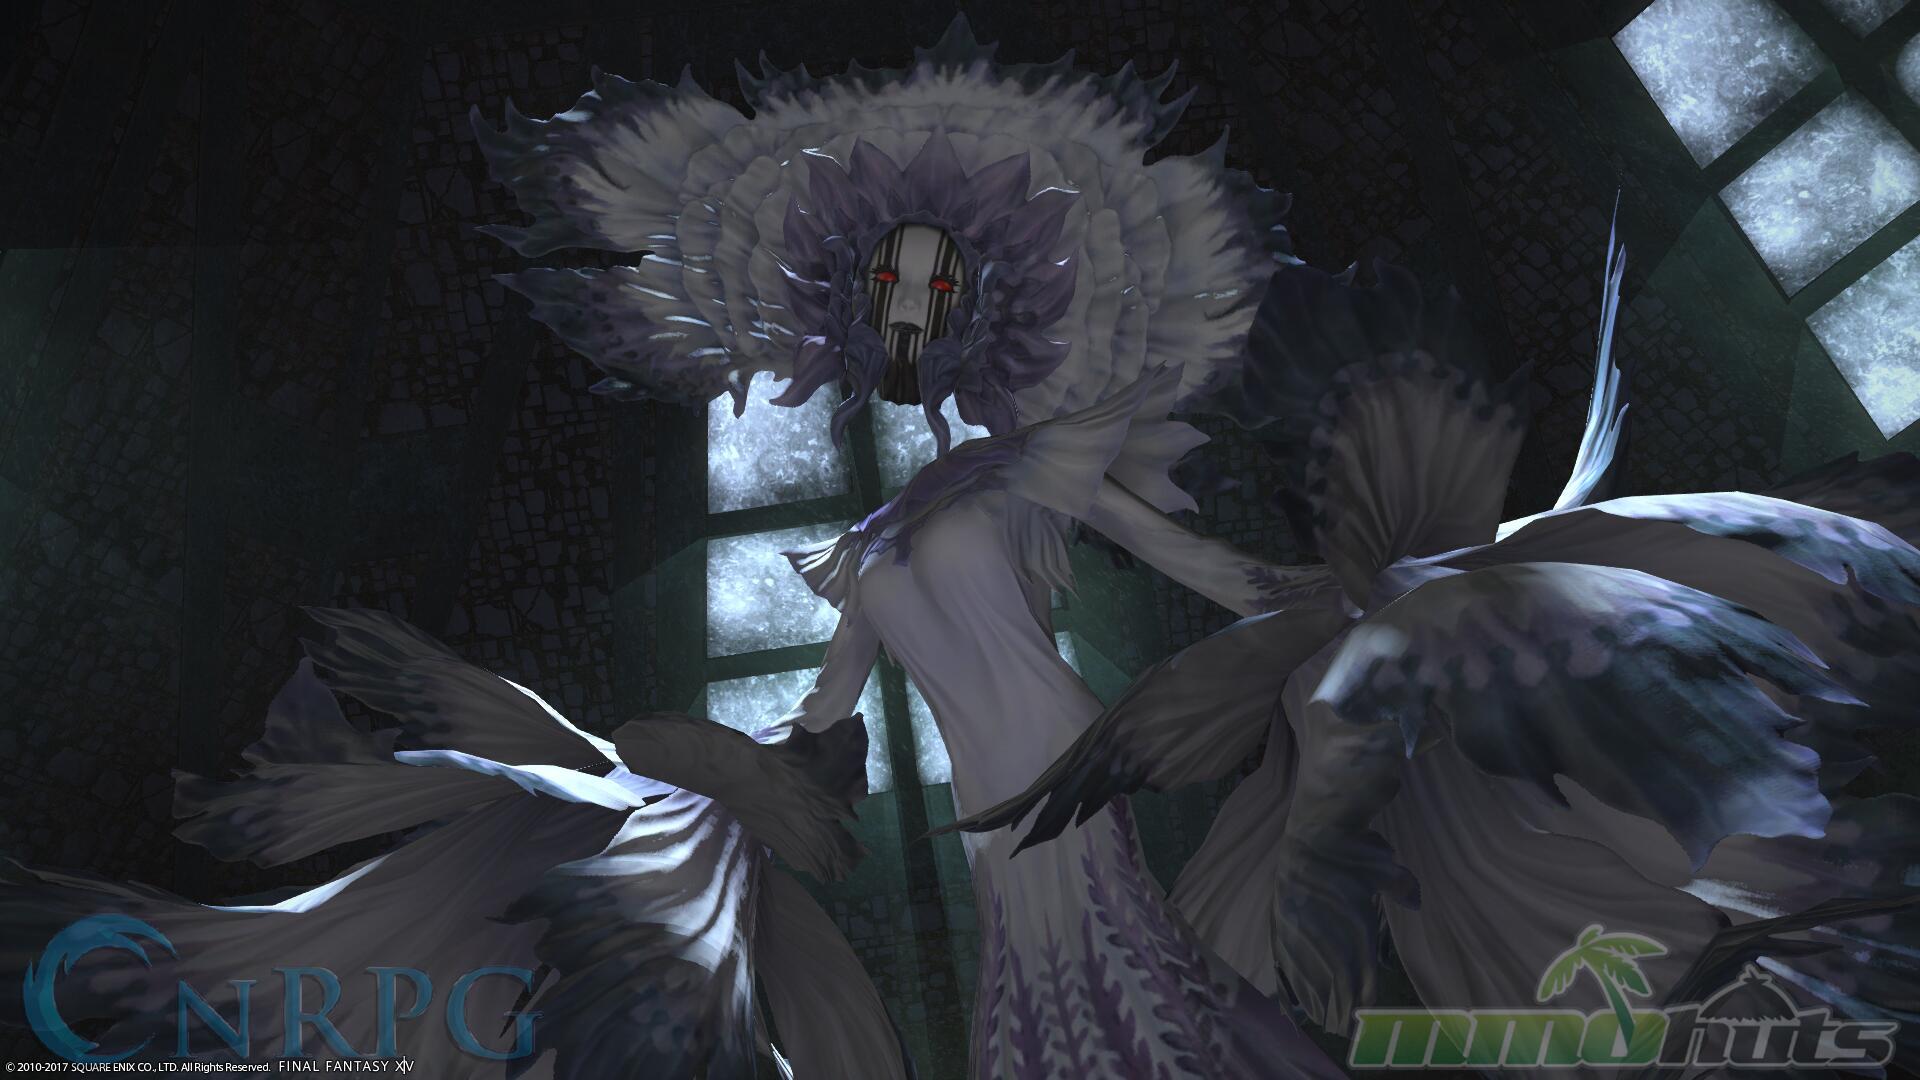 Final Fantasy XIV: Stormblood Launch Review | MMOHuts